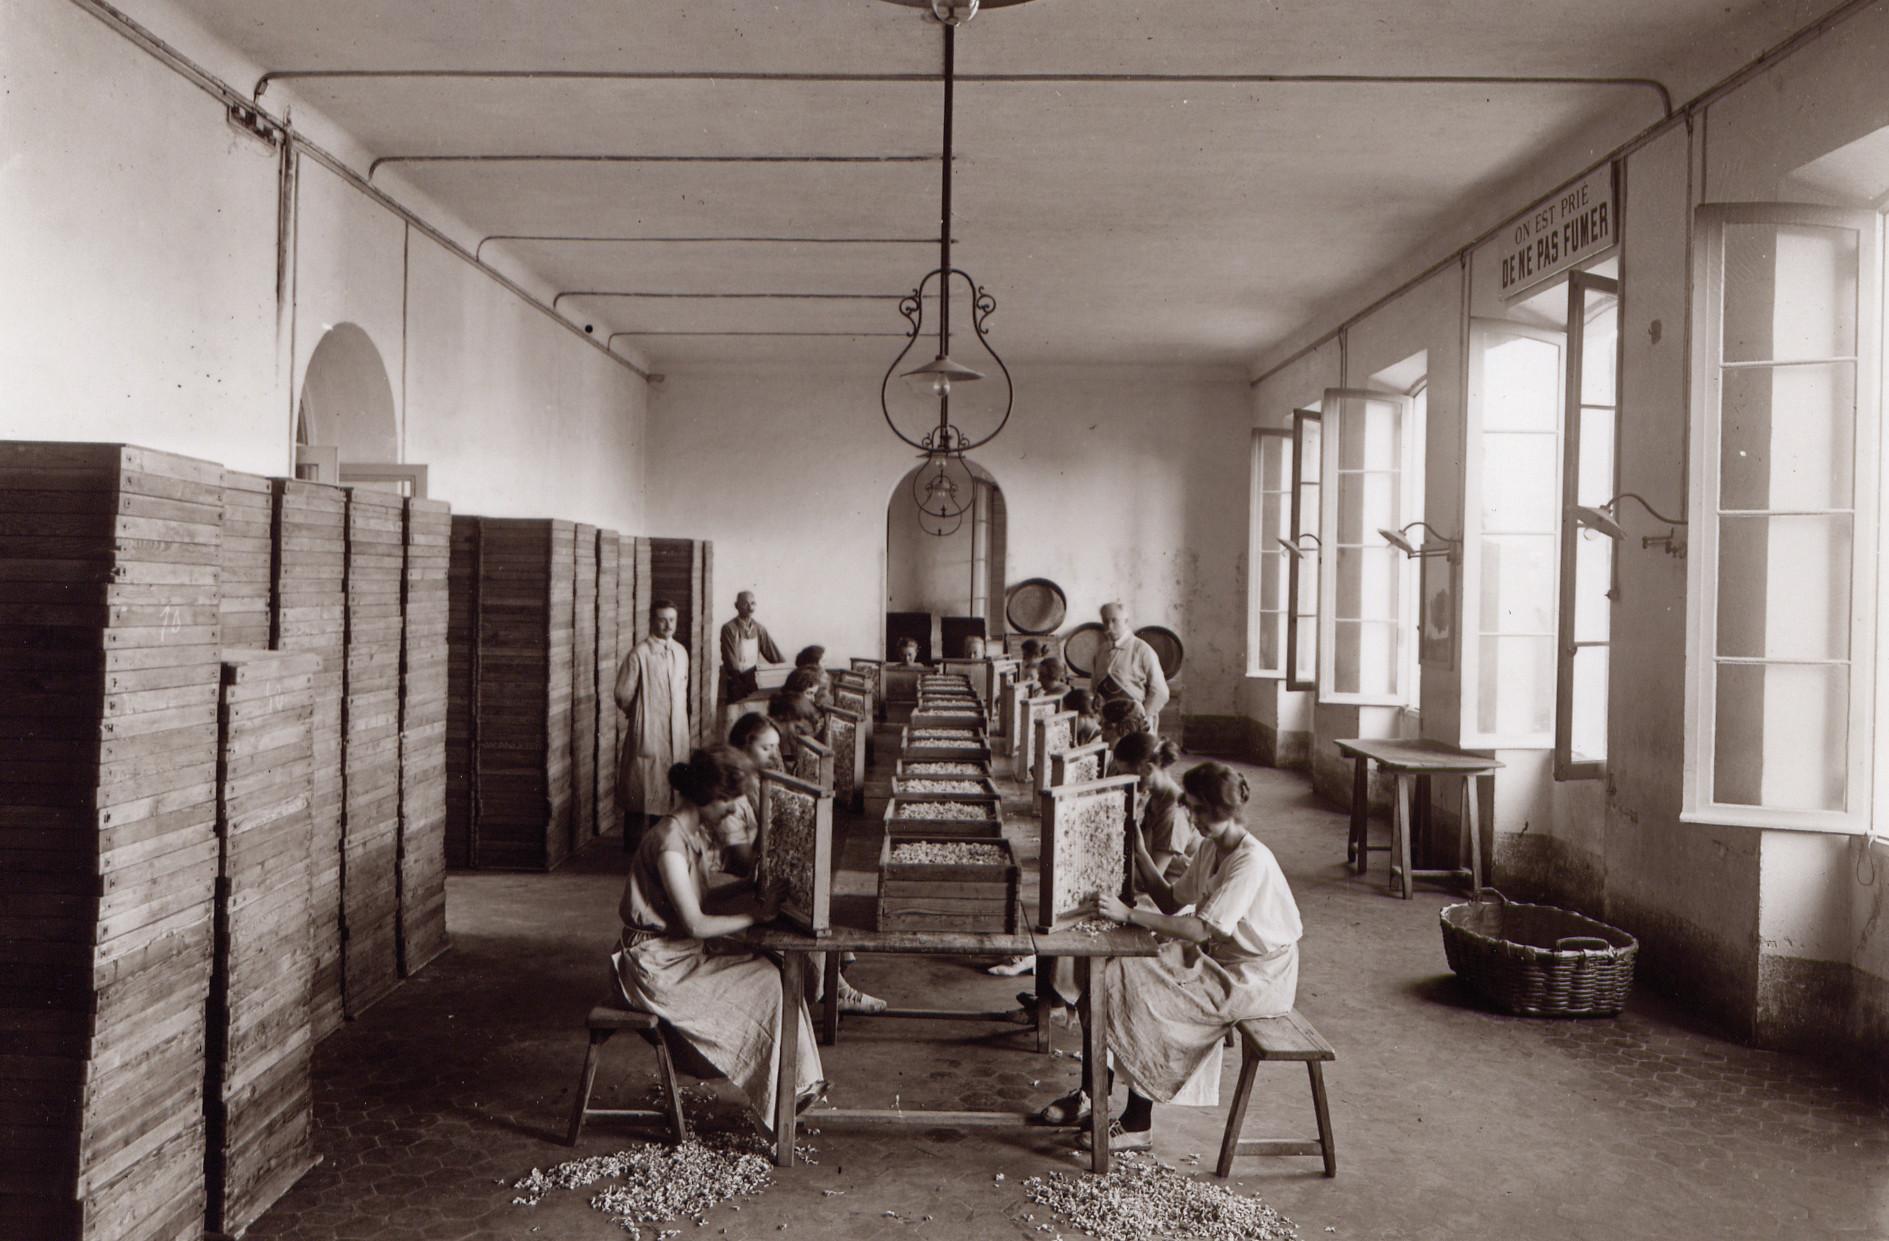 Lubin usine cannes 1924--2 (7)